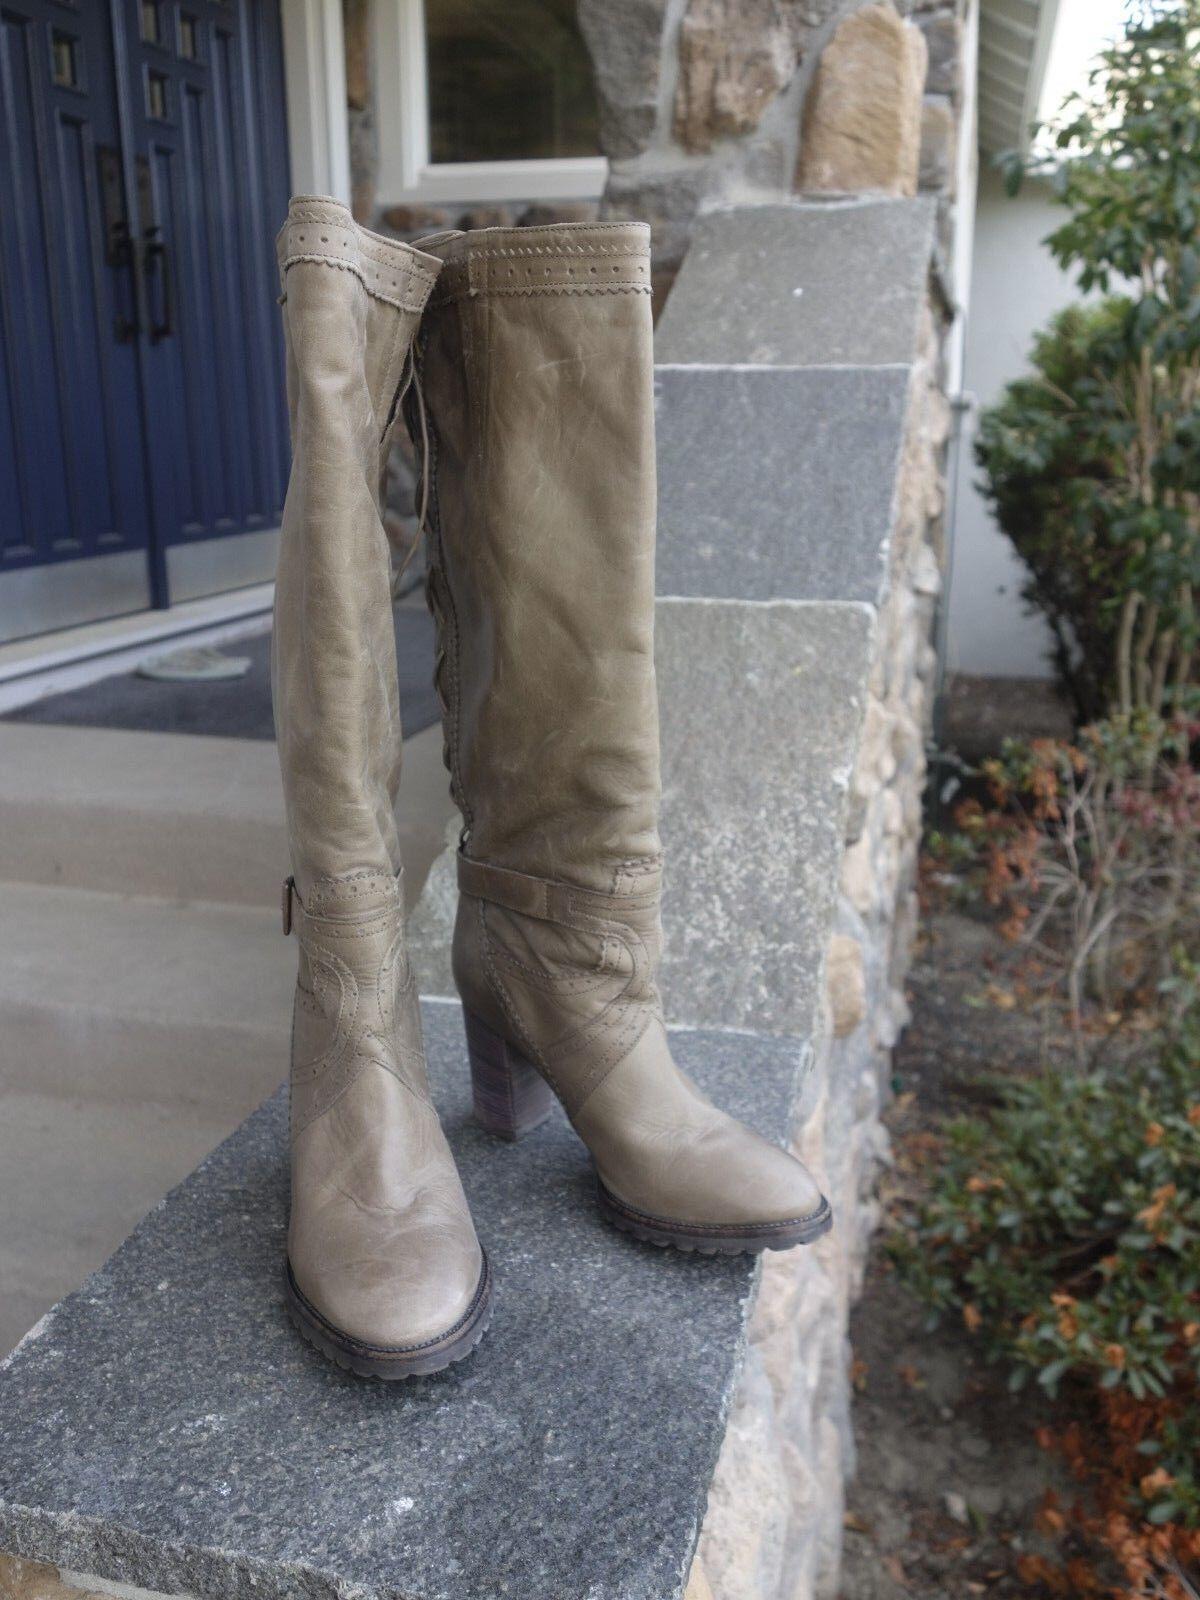 Fabianelli  Dark Tan Leather Knee High Heel stivali donna Dimensione 38 EUR Style A54